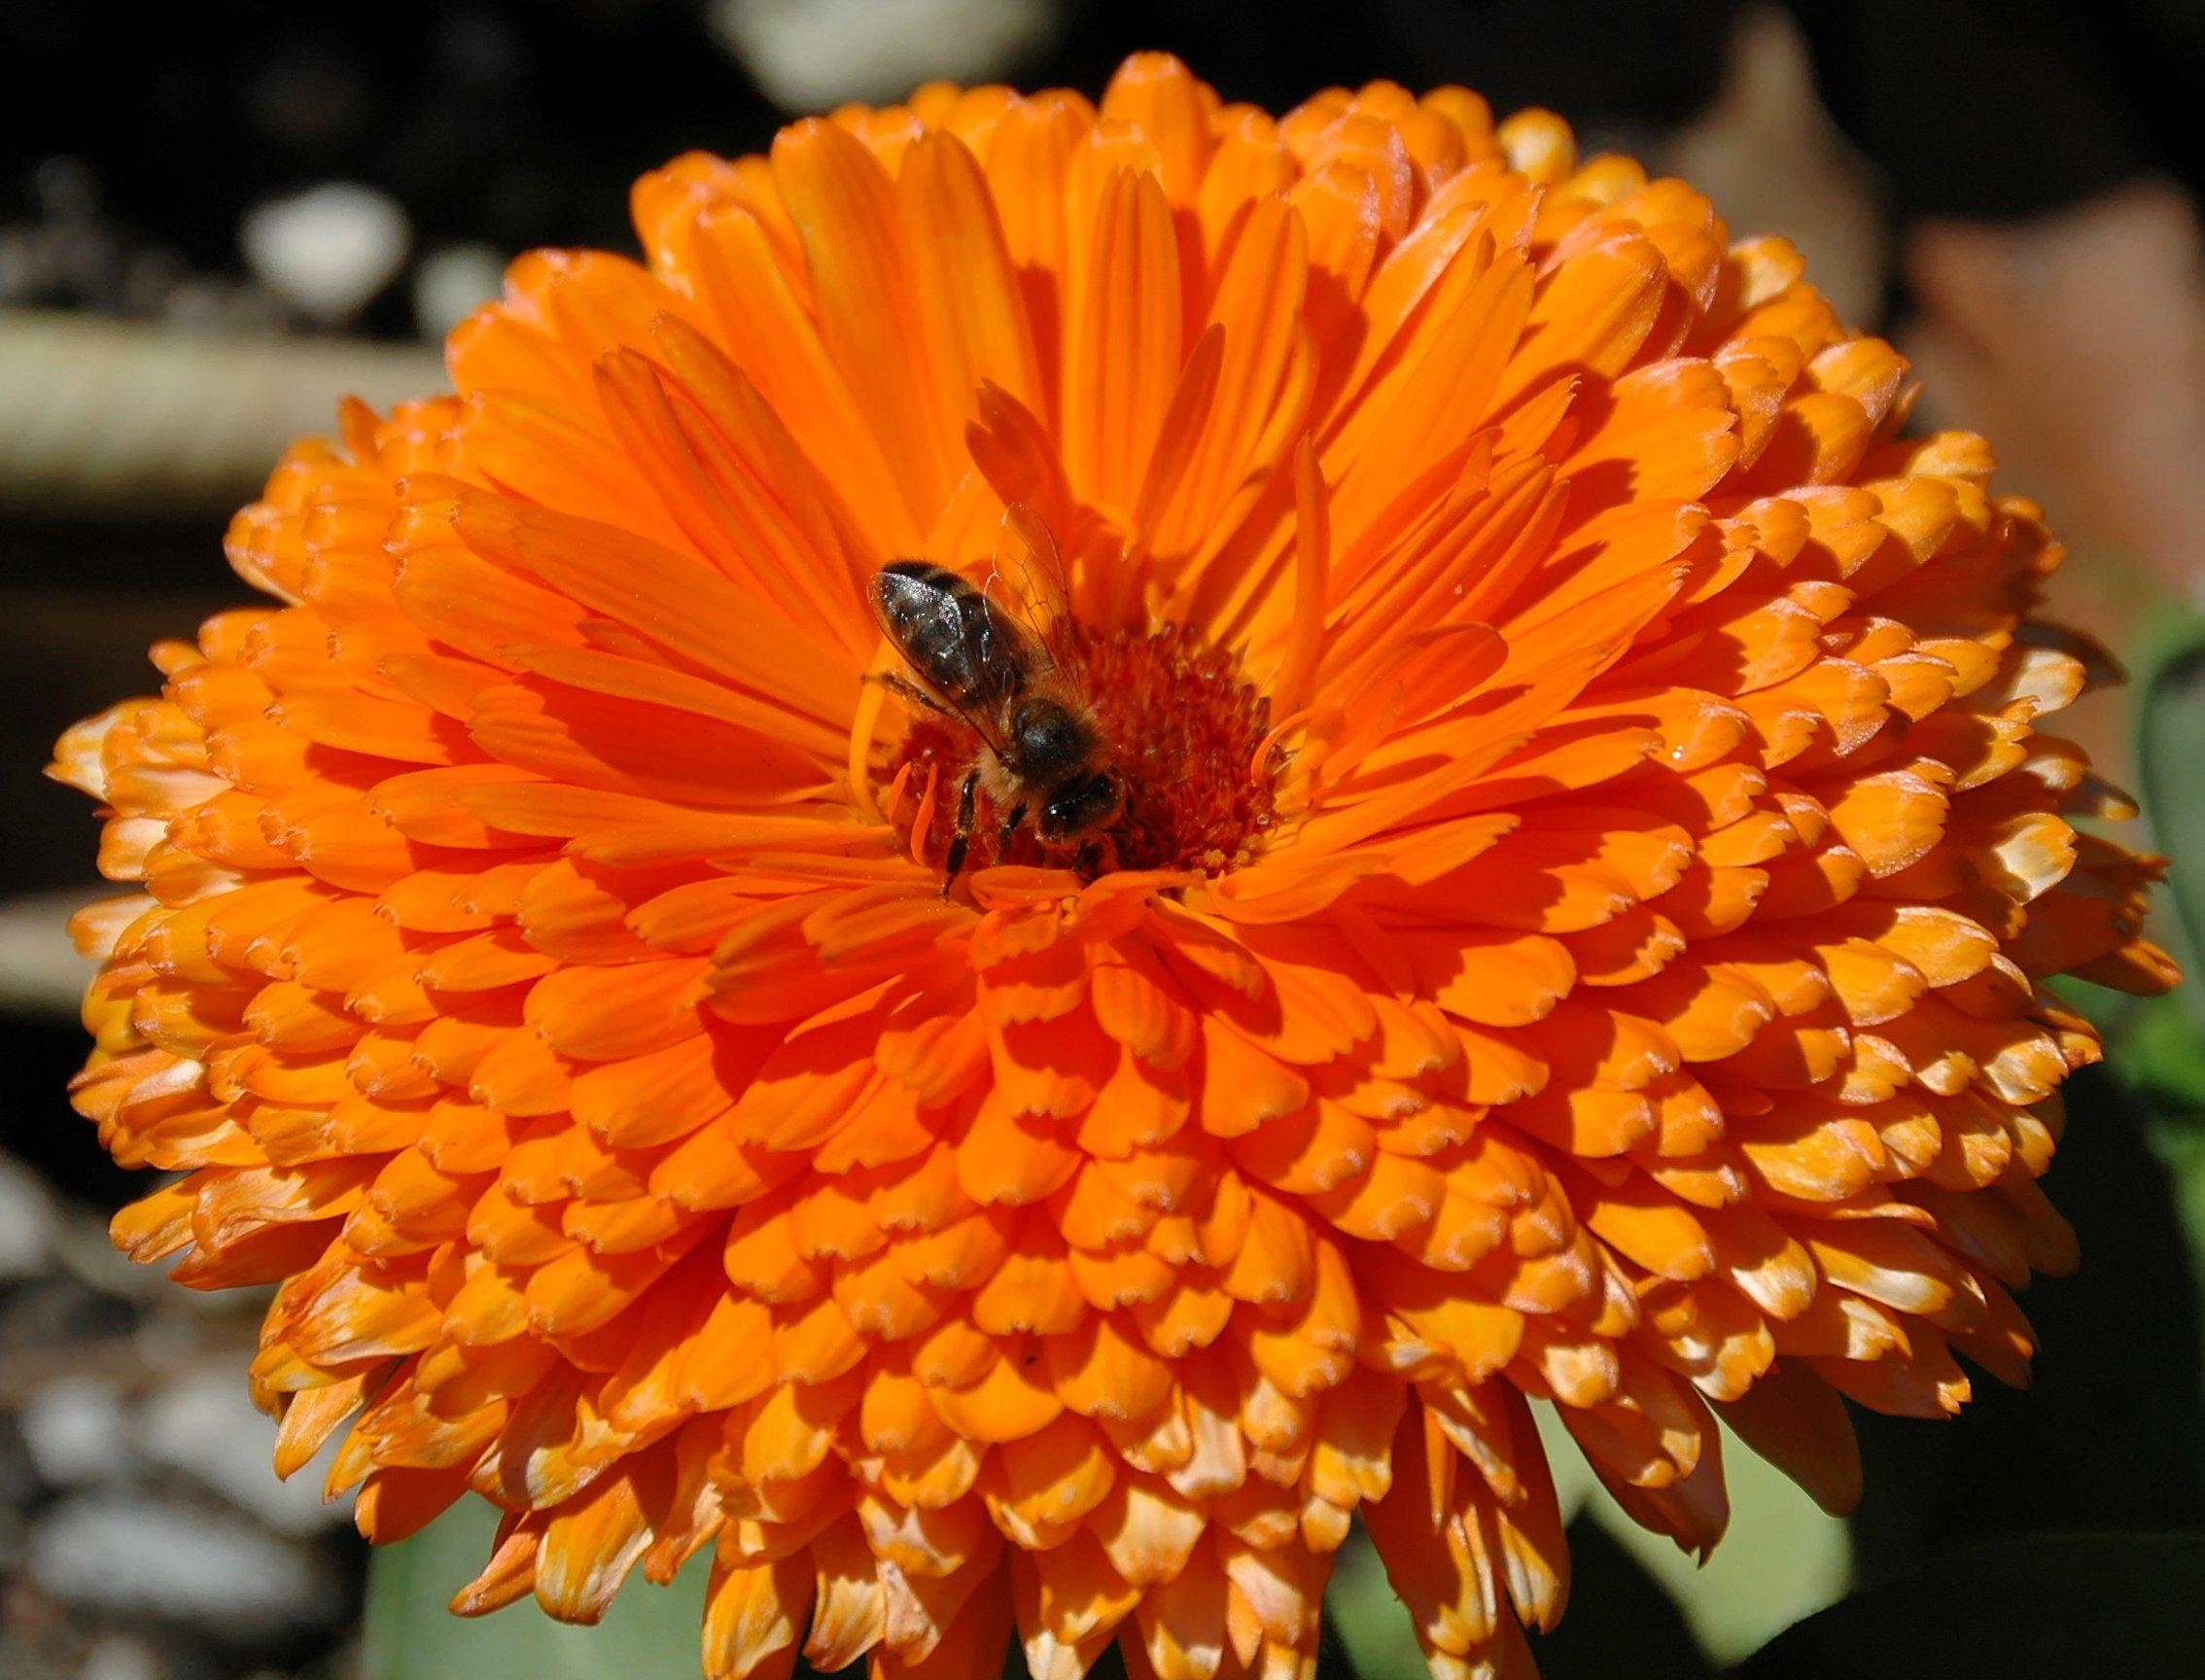 6678 Orange Flower with Bee